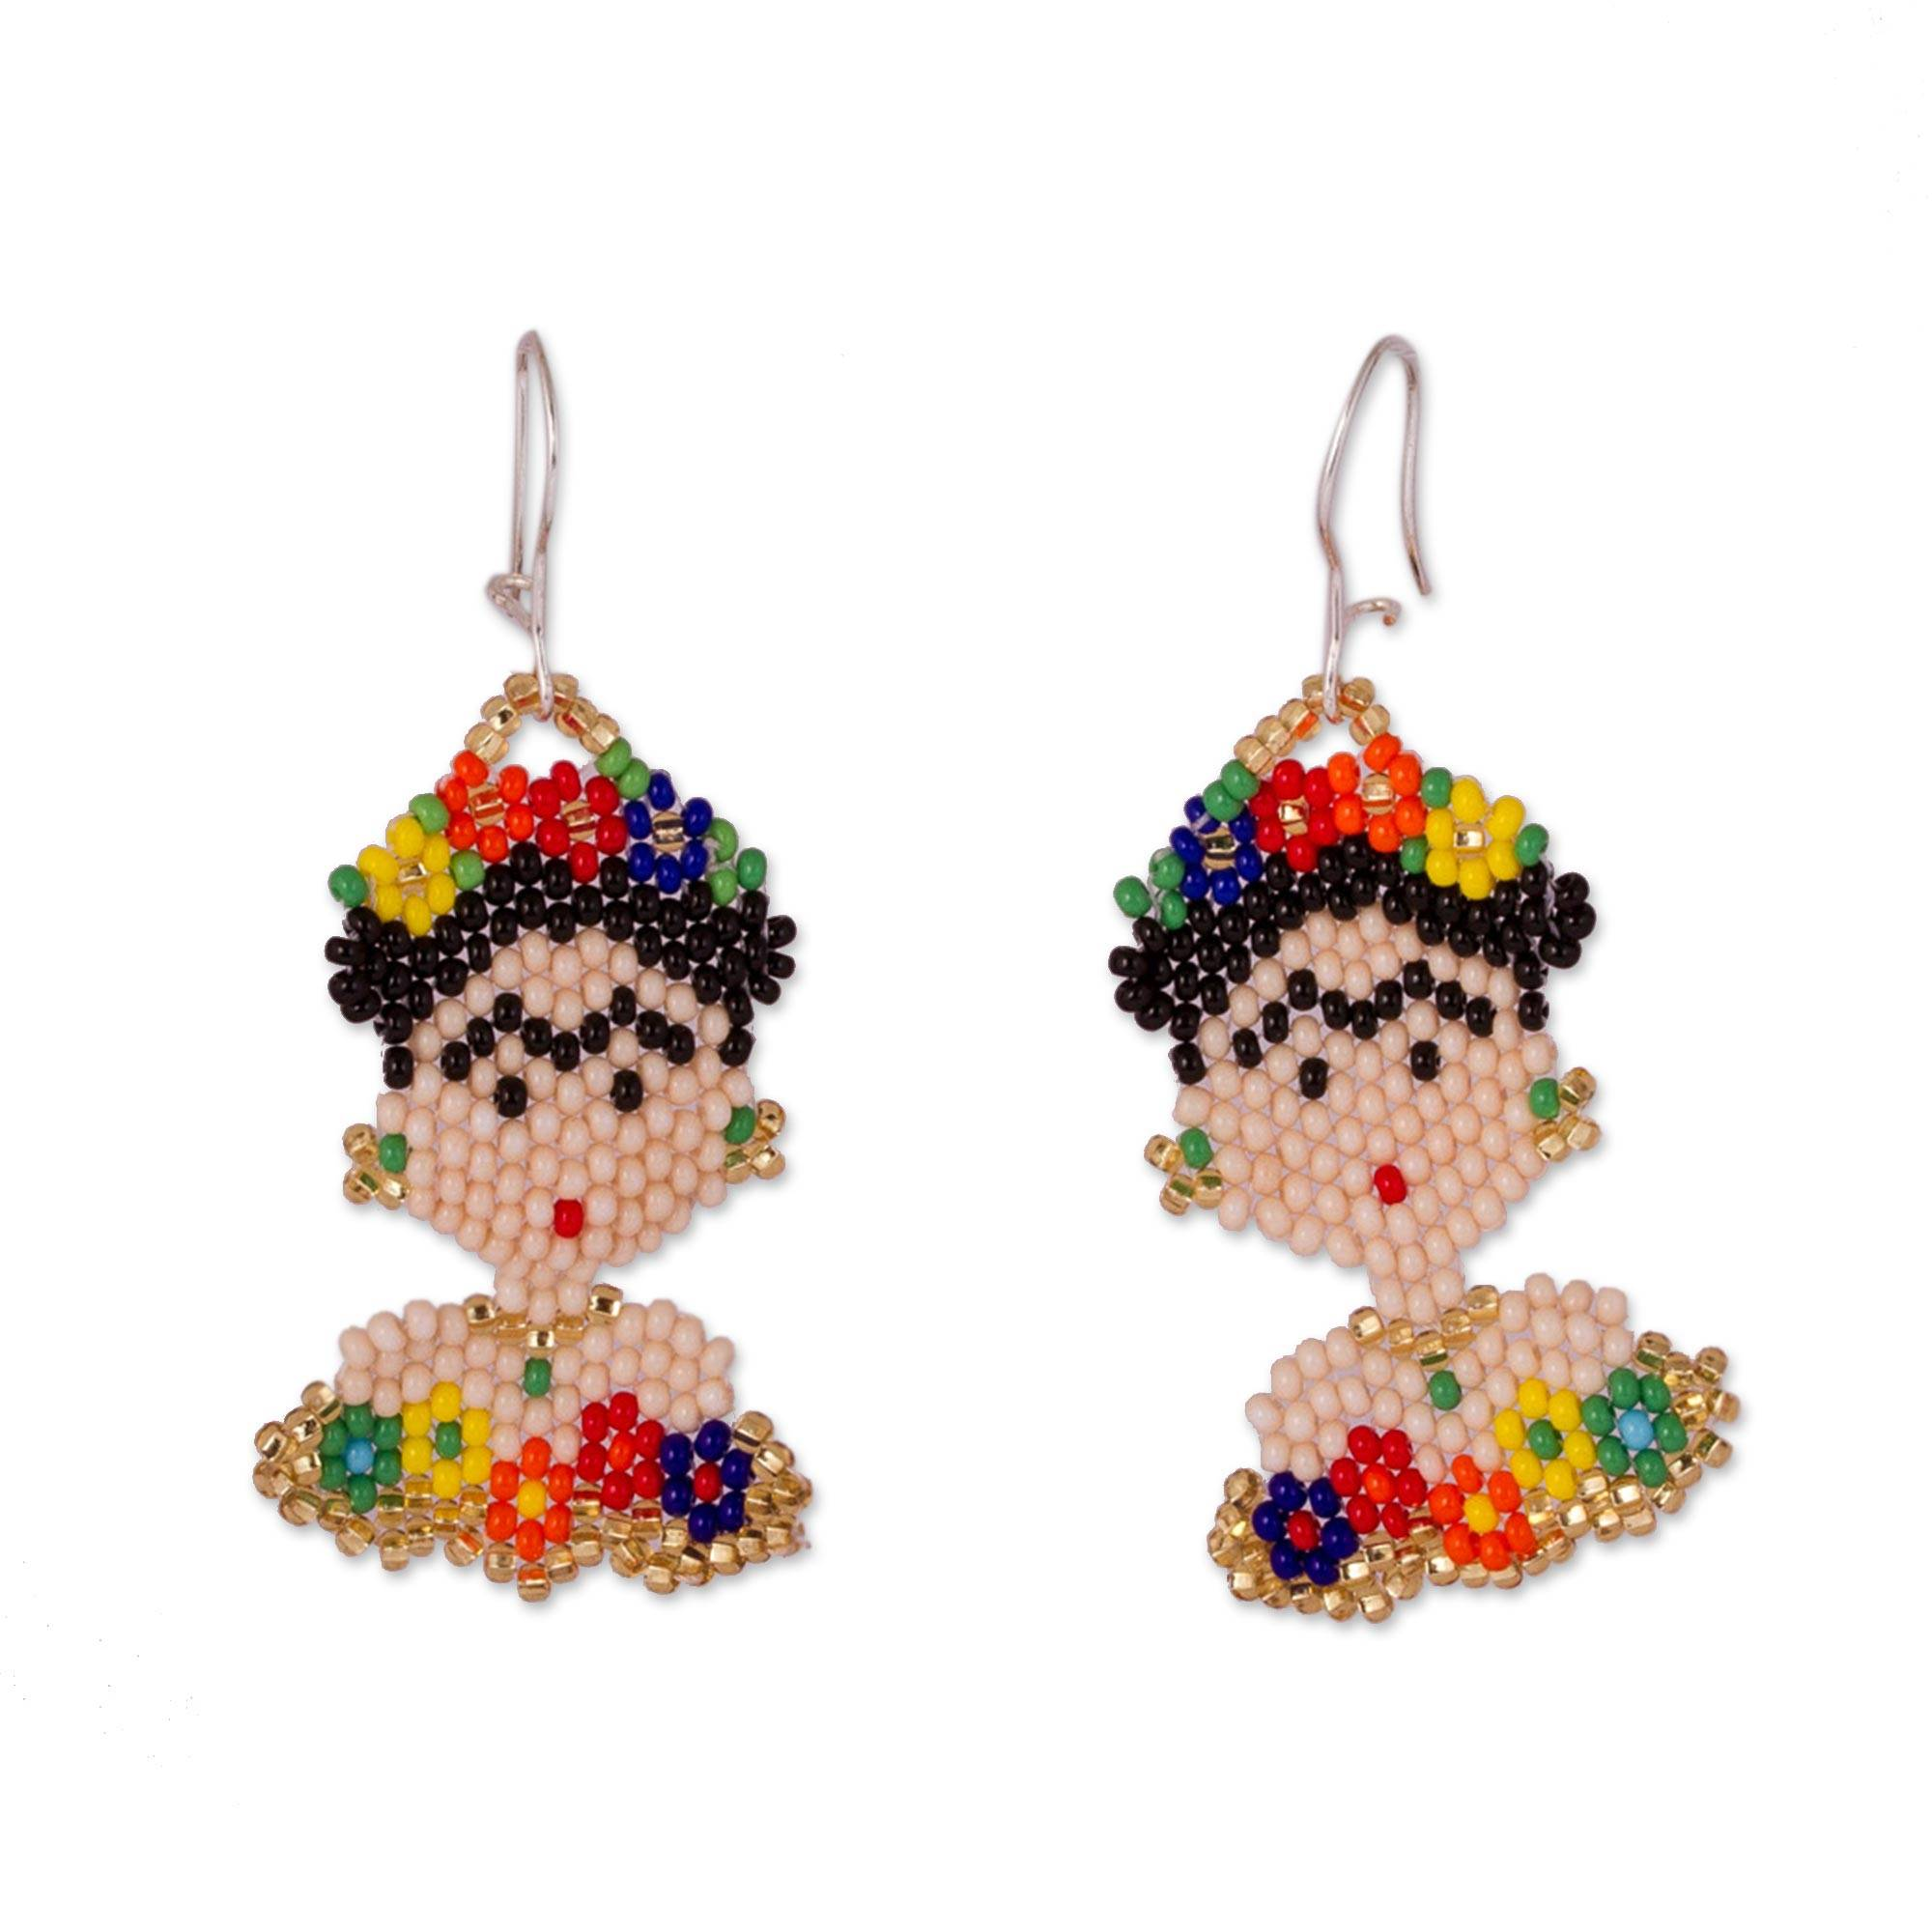 Gift for Her Maasai Earrings Handmade Earrings 10 pairs of Earrings Wholesale Earrings Earrings for Women Sale African Beaded Earrings